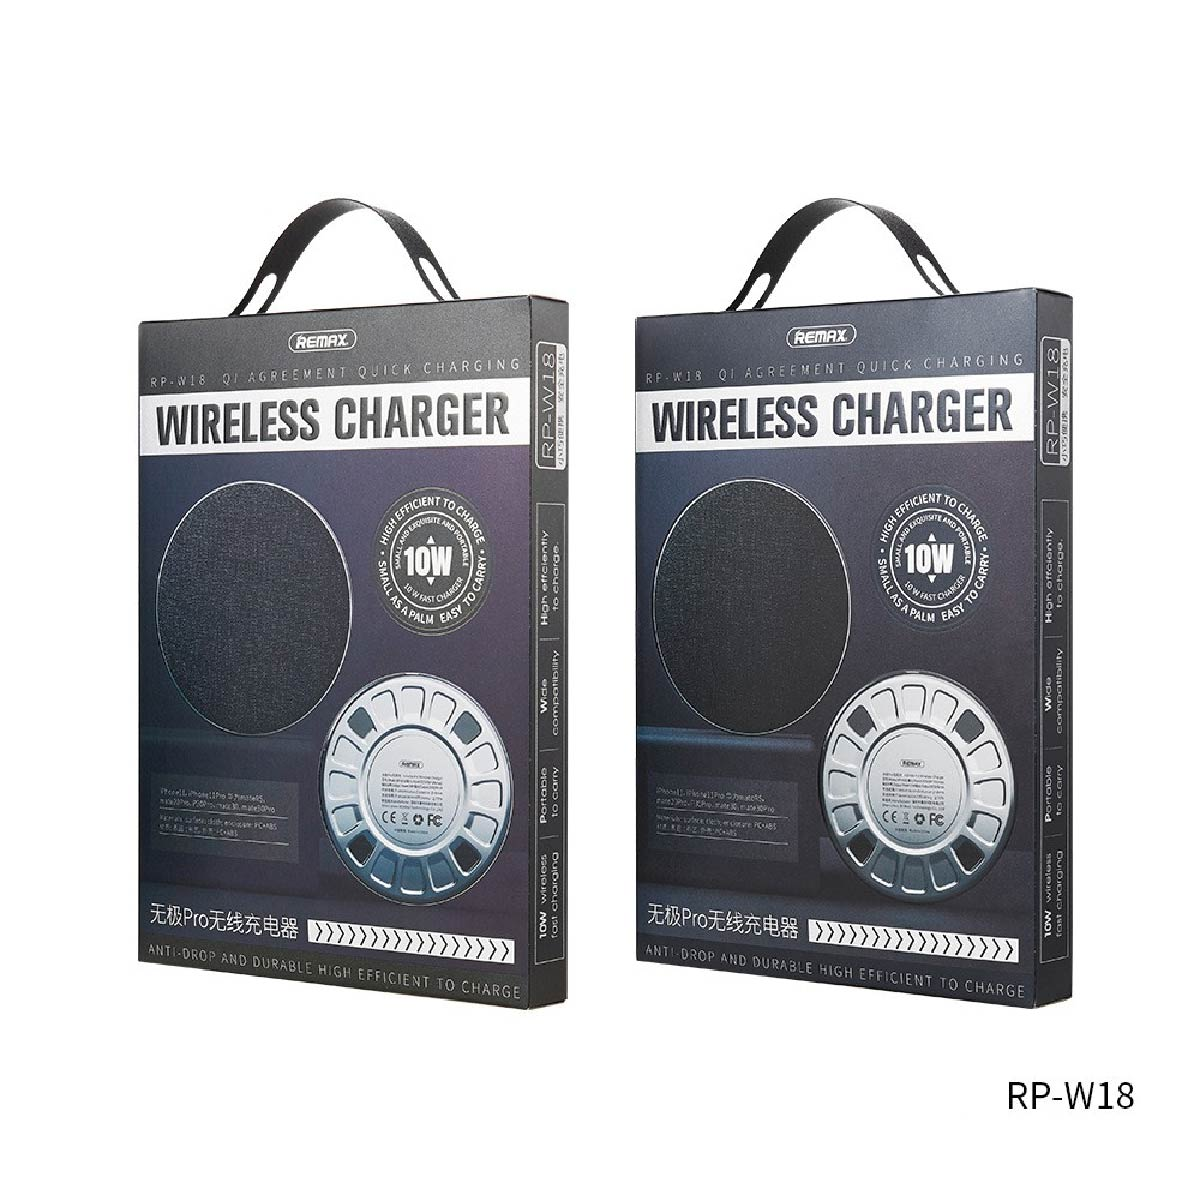 Carregador Sem Fio Wireless Qi 10w Carga Rápida Remax Rp-w18